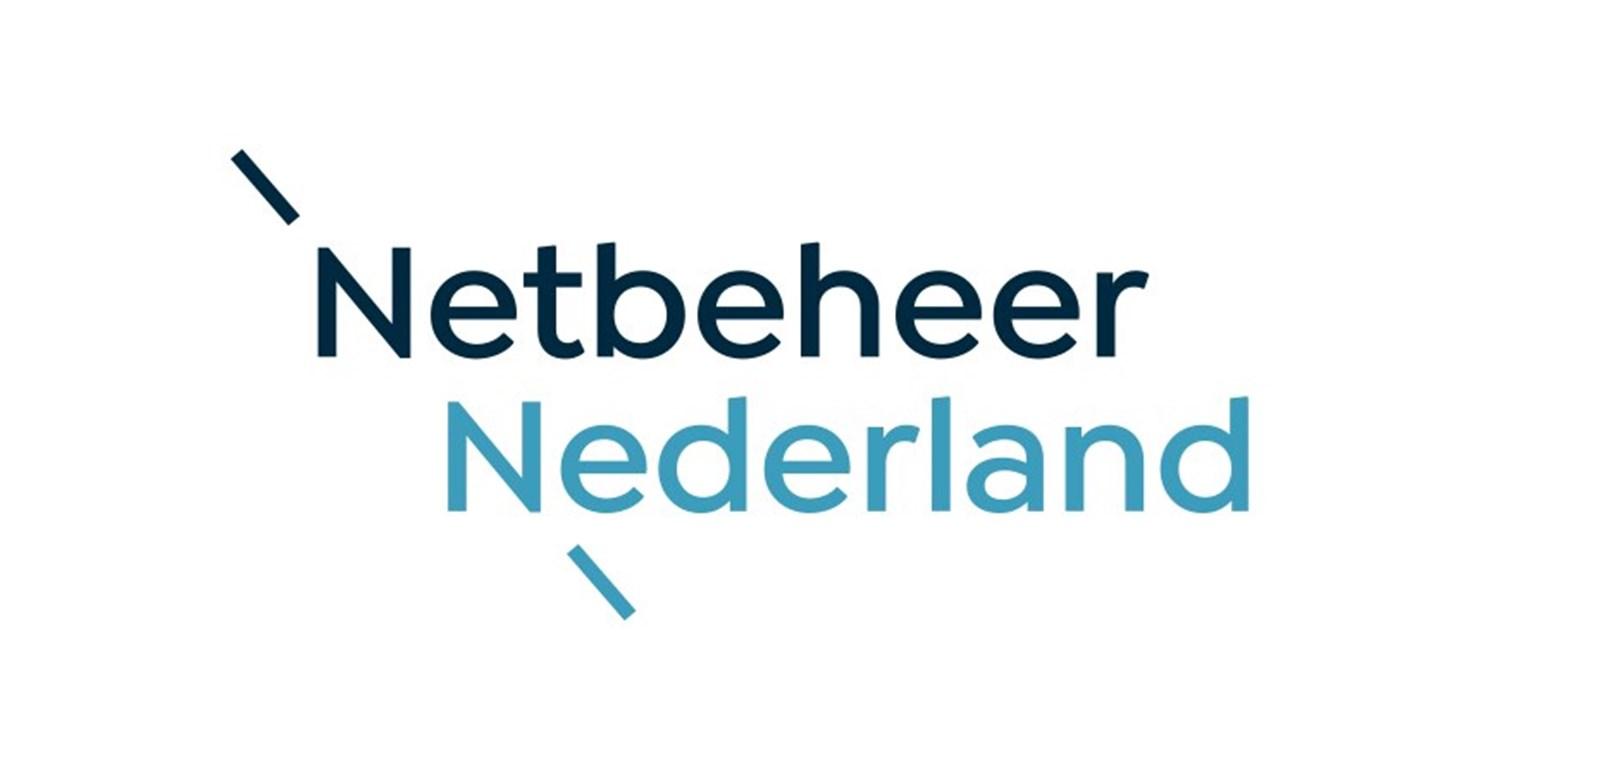 Netbeheer Nederland